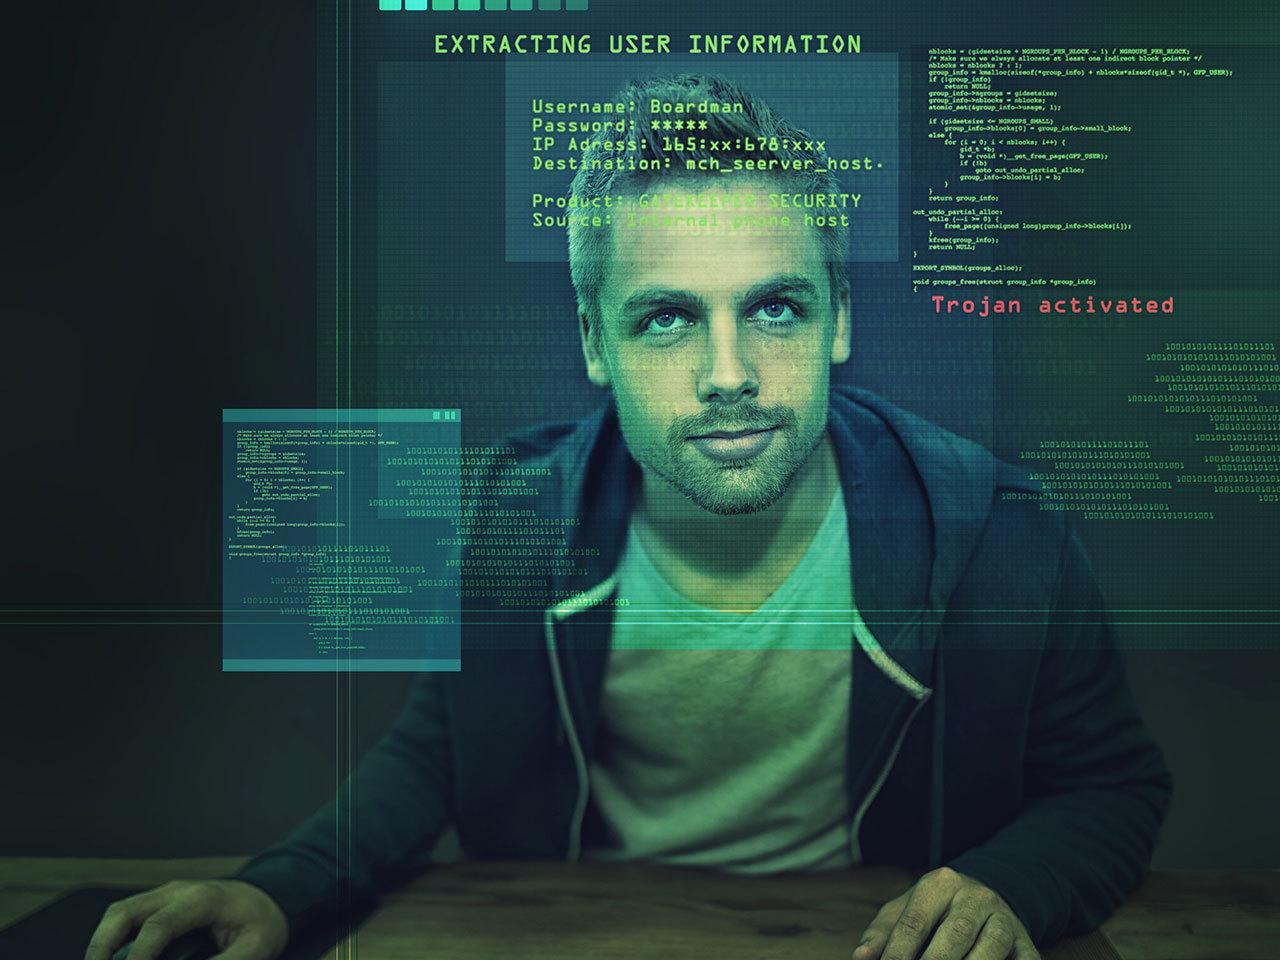 Sticky Attacks: когда функция залипания клавиш помогает хакерам - 1